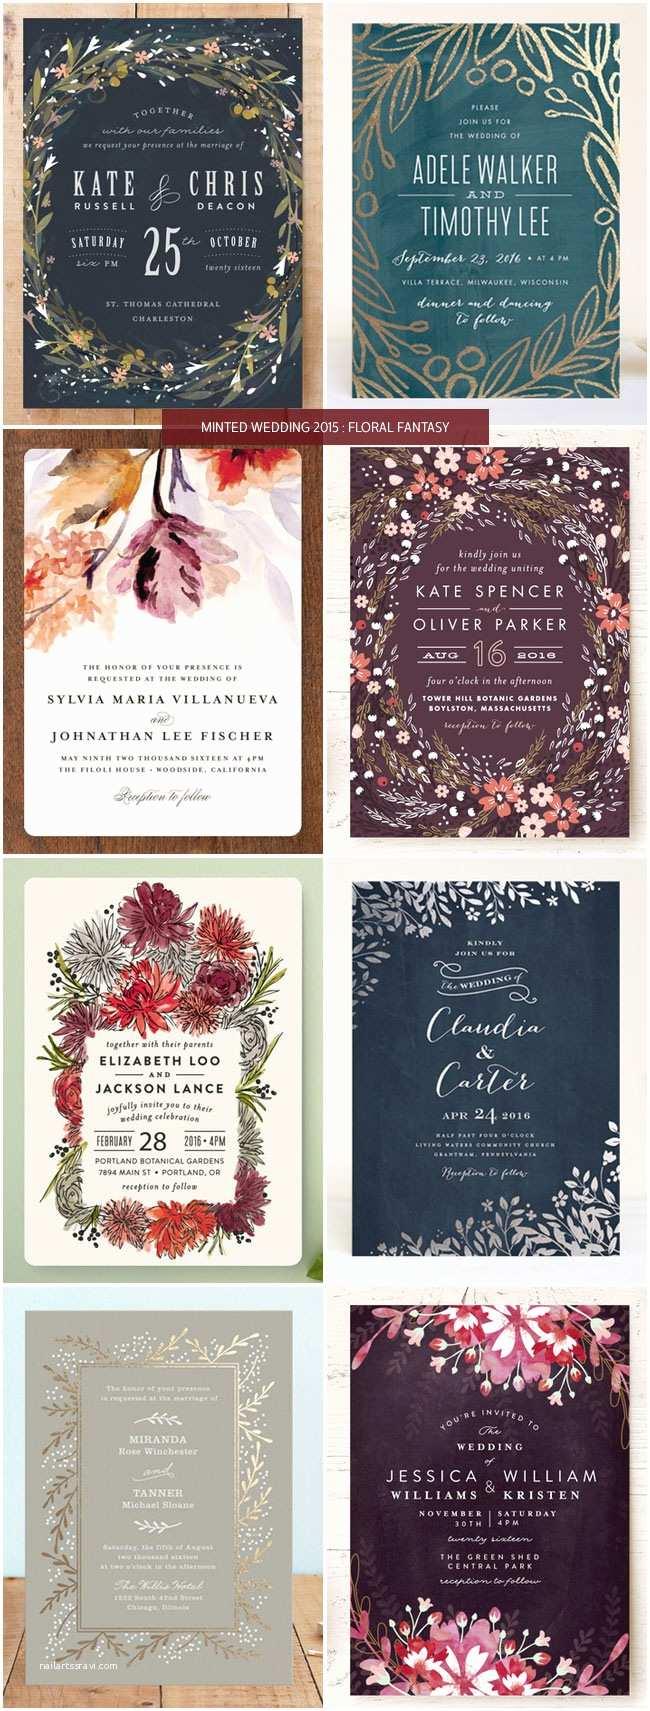 Minted Wedding Invitations Minted Wedding Invitations 2015 Floral Invitation Crush